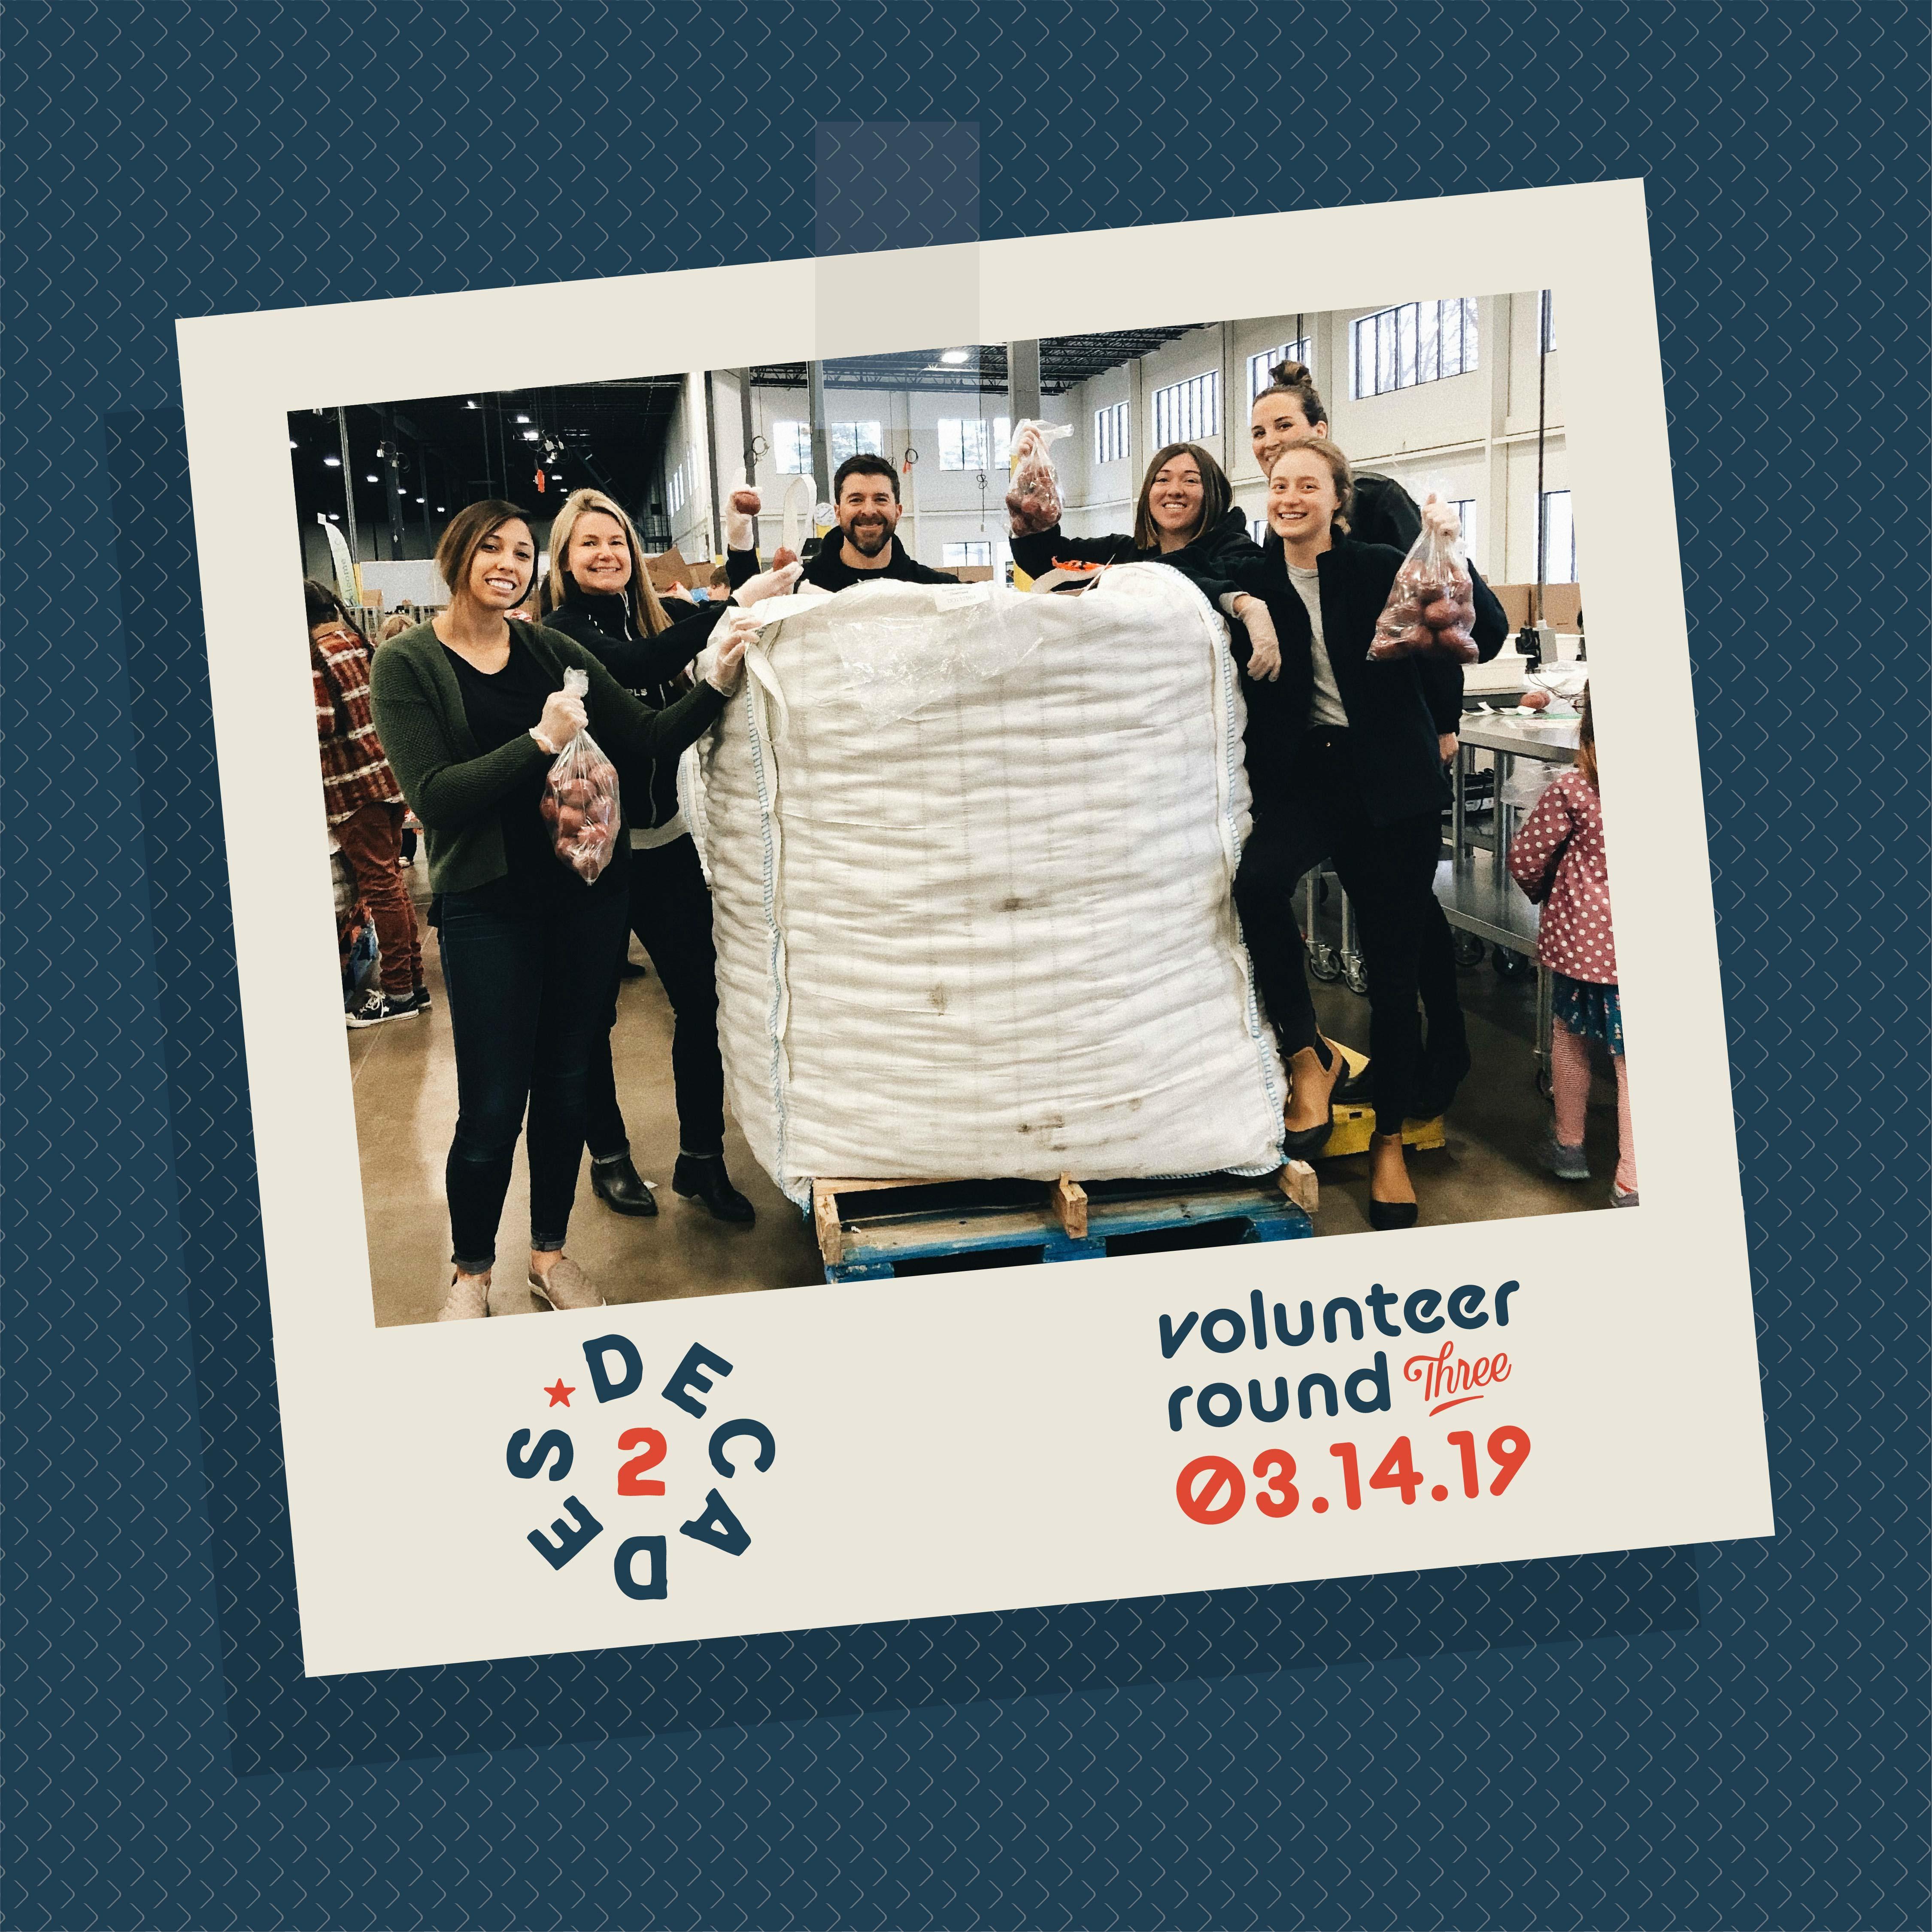 SDCo Volunteer Round 3